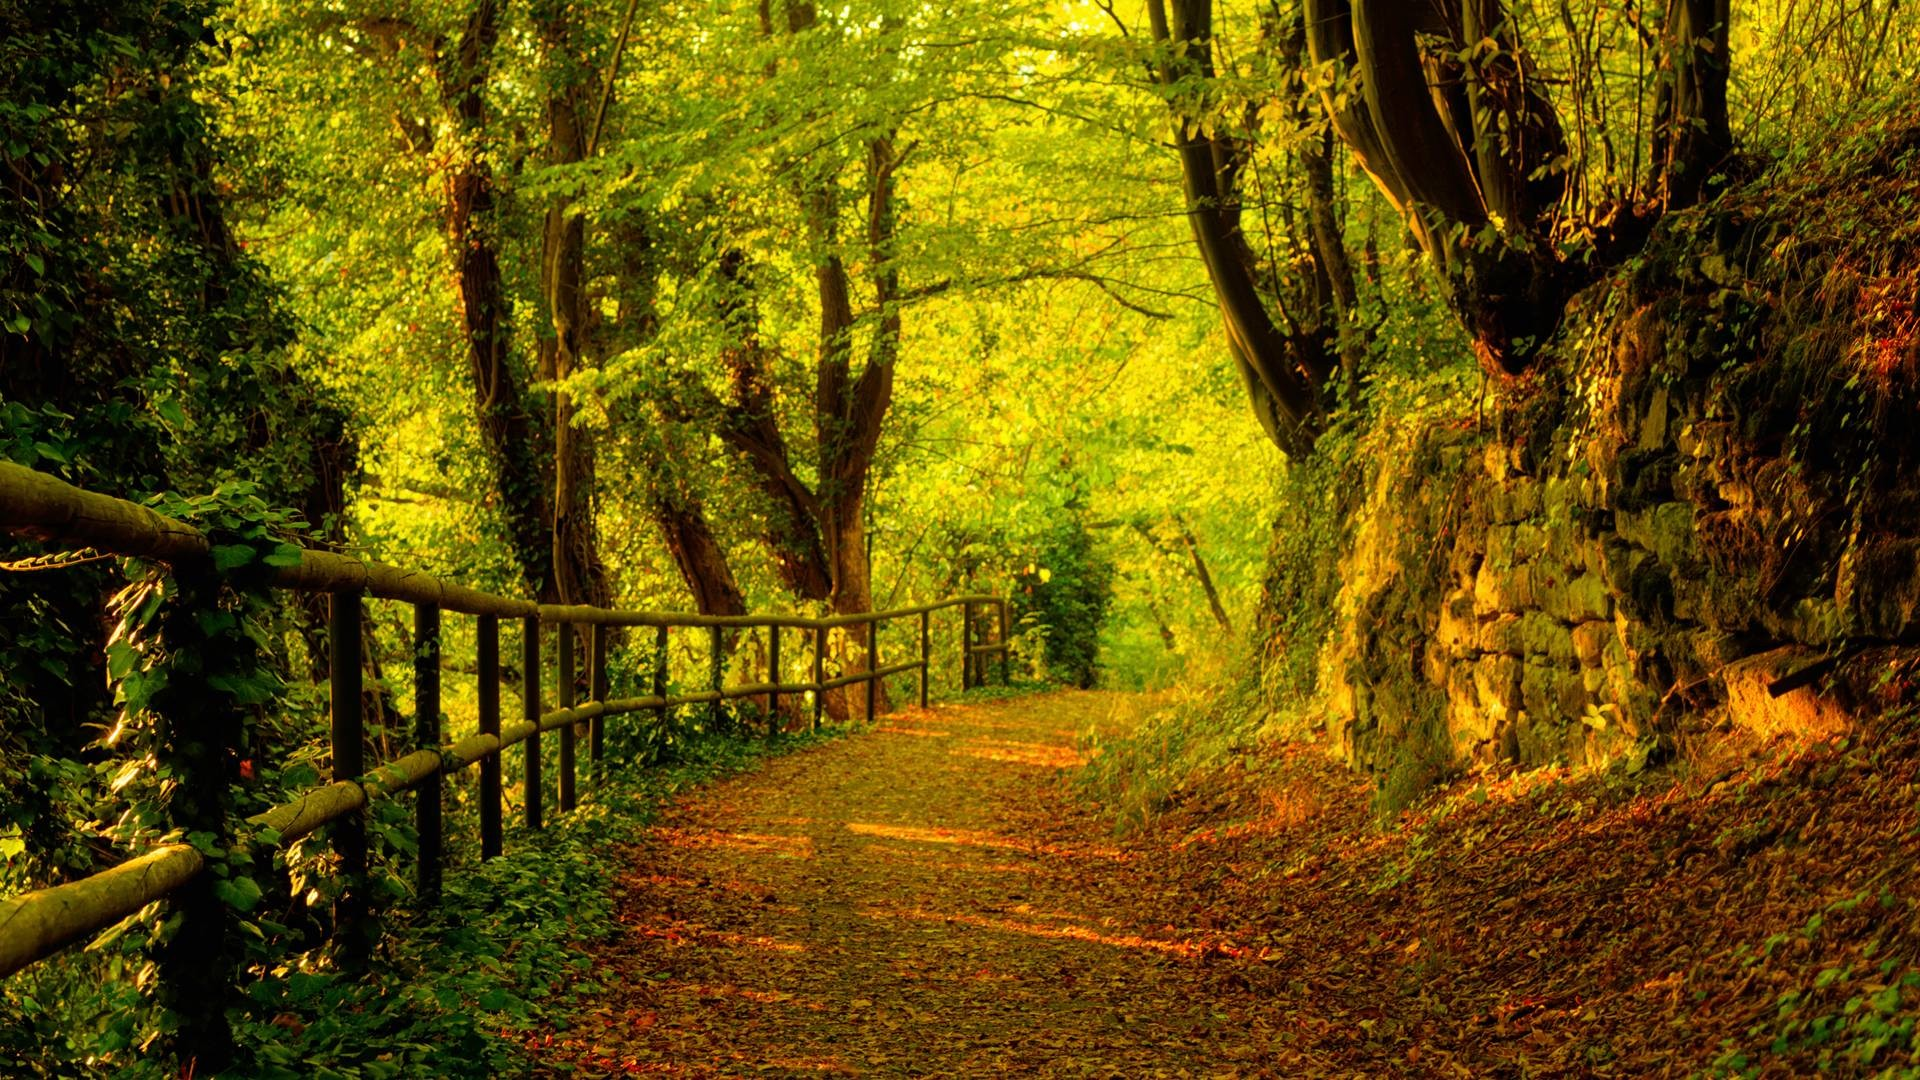 Trees-Autumn-season-Forest-Path-Fresh-New-Hd-